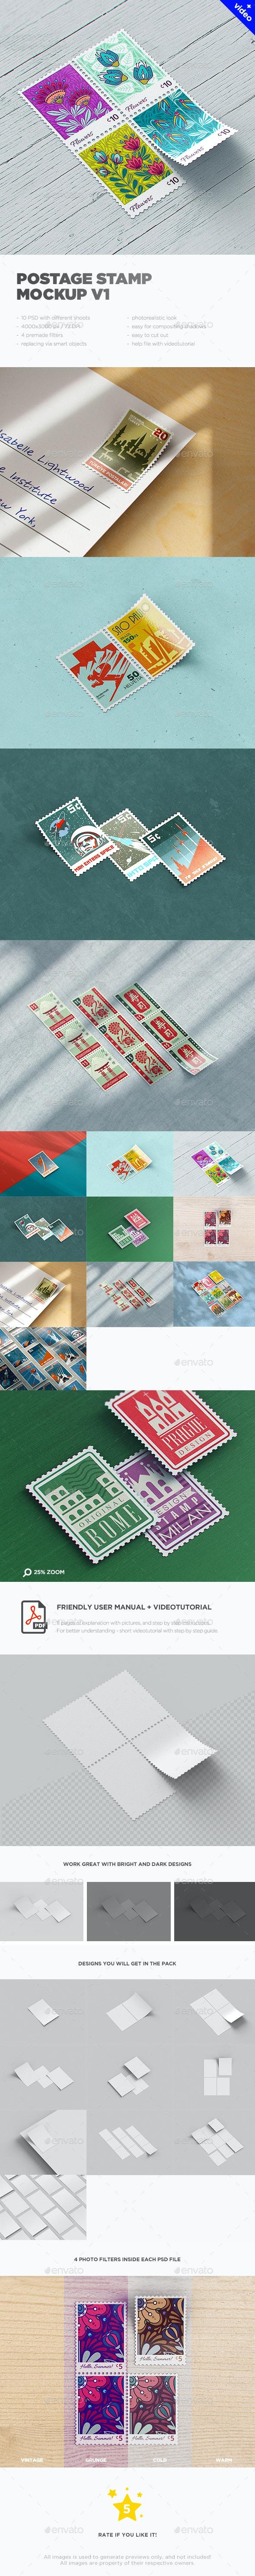 Postage Stamp MockUp v1 - Miscellaneous Print